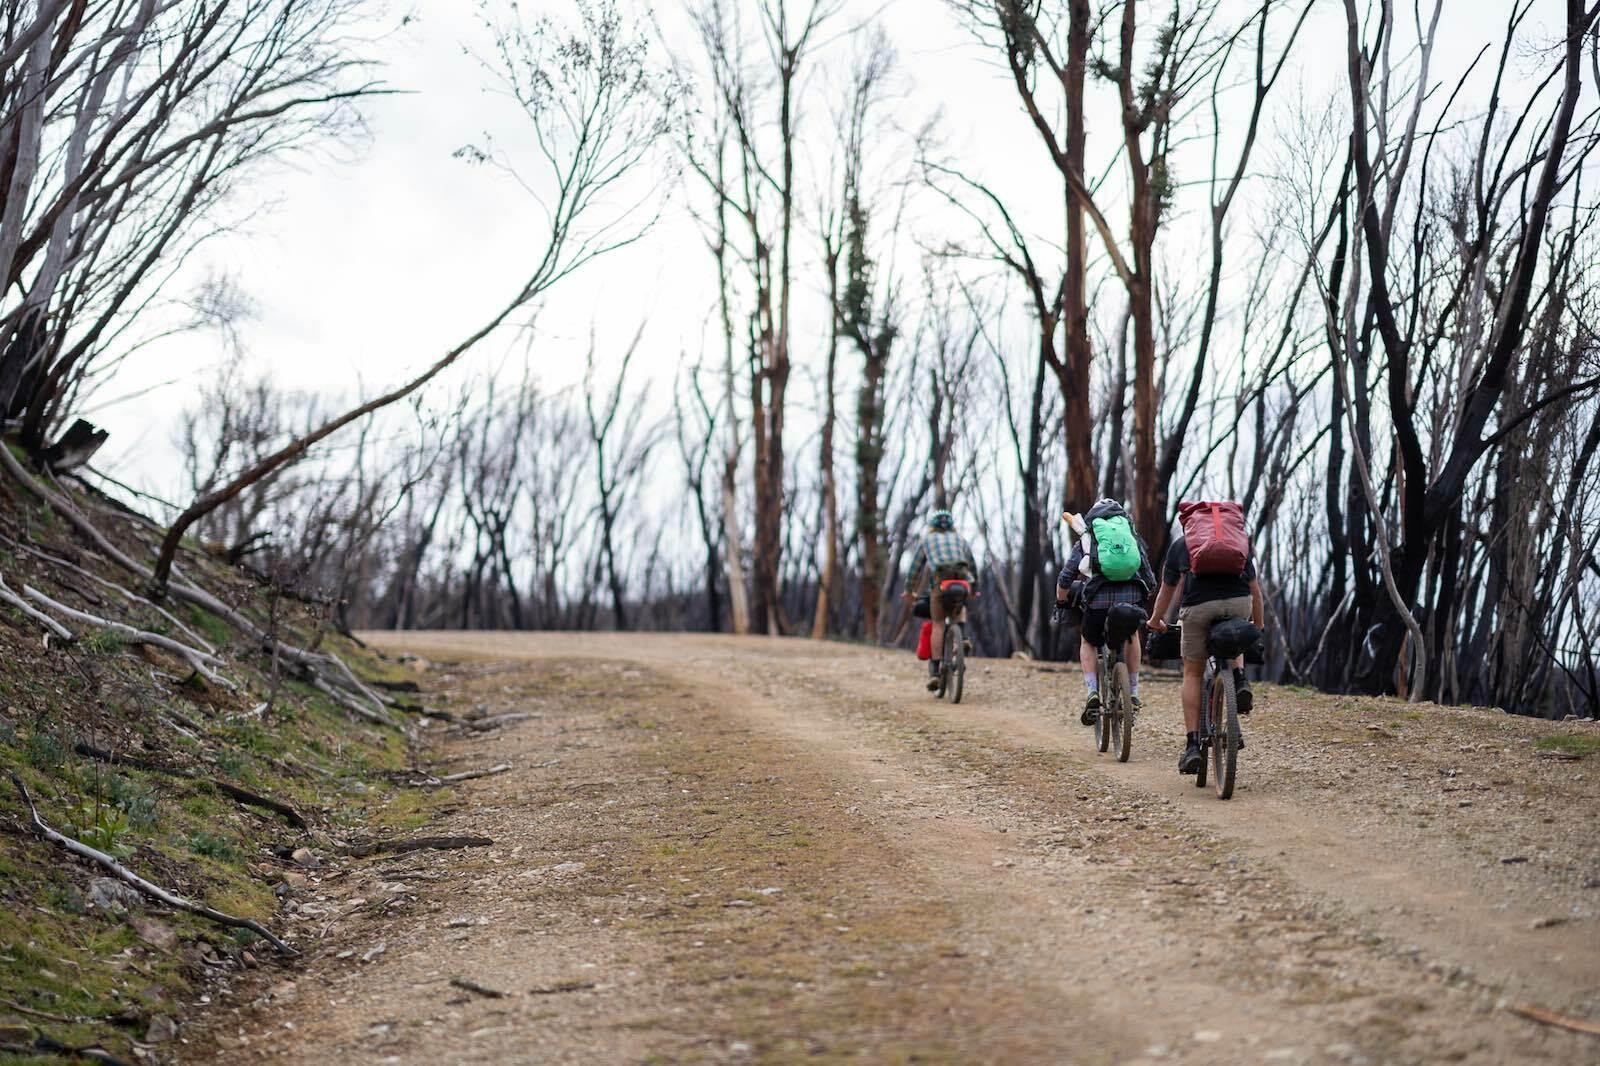 bikepacking through a forest in the Jagungal Wilderness